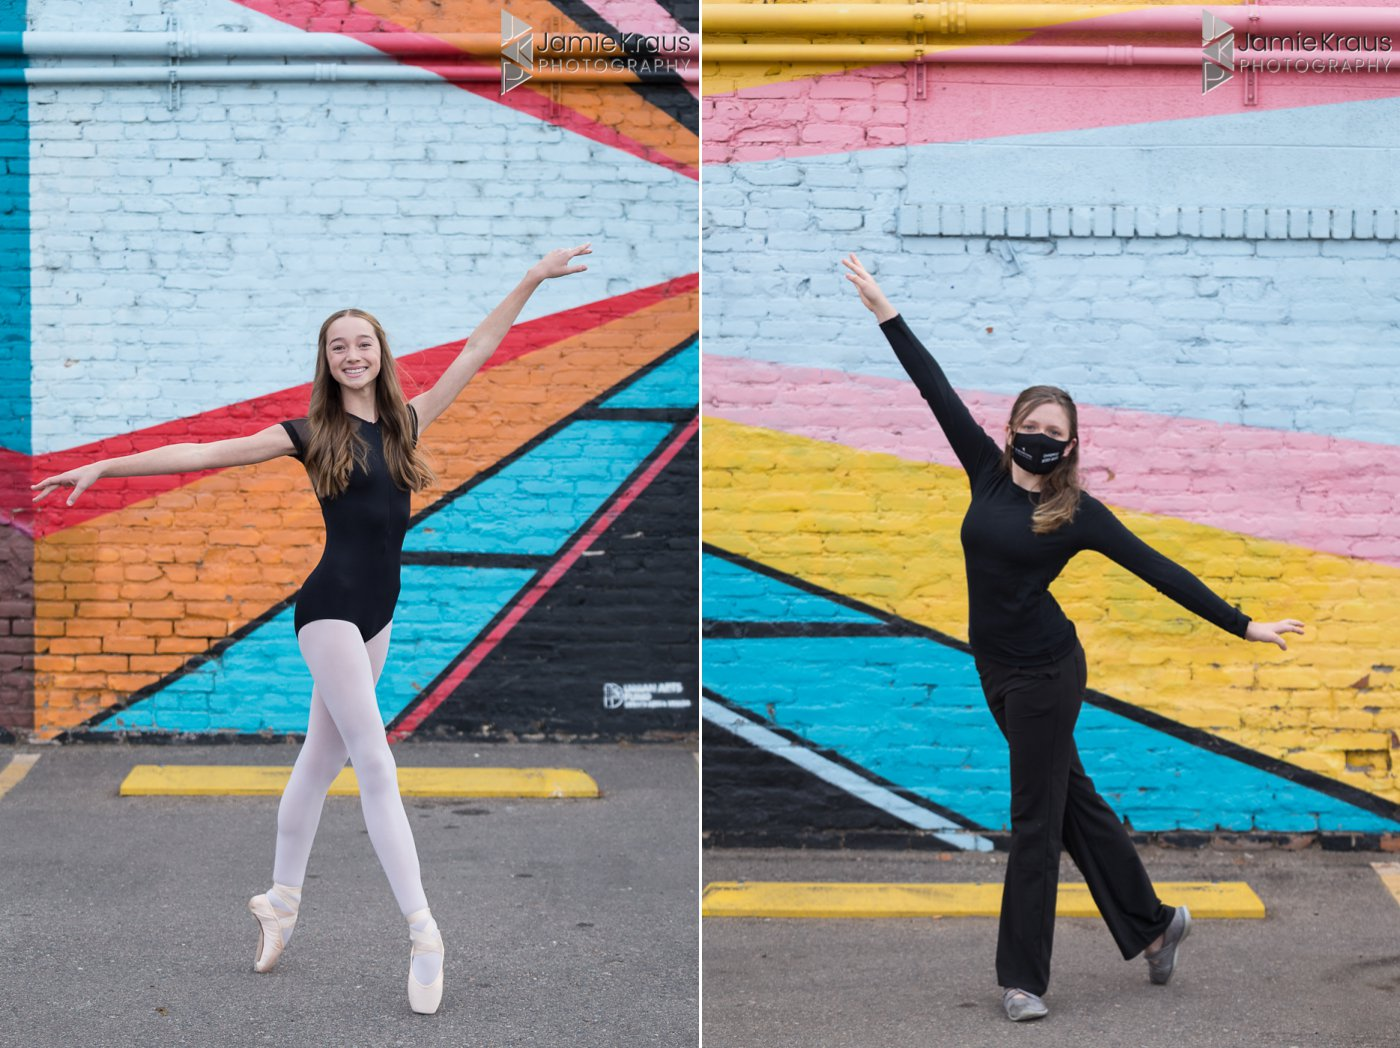 denver dance school photoshoot